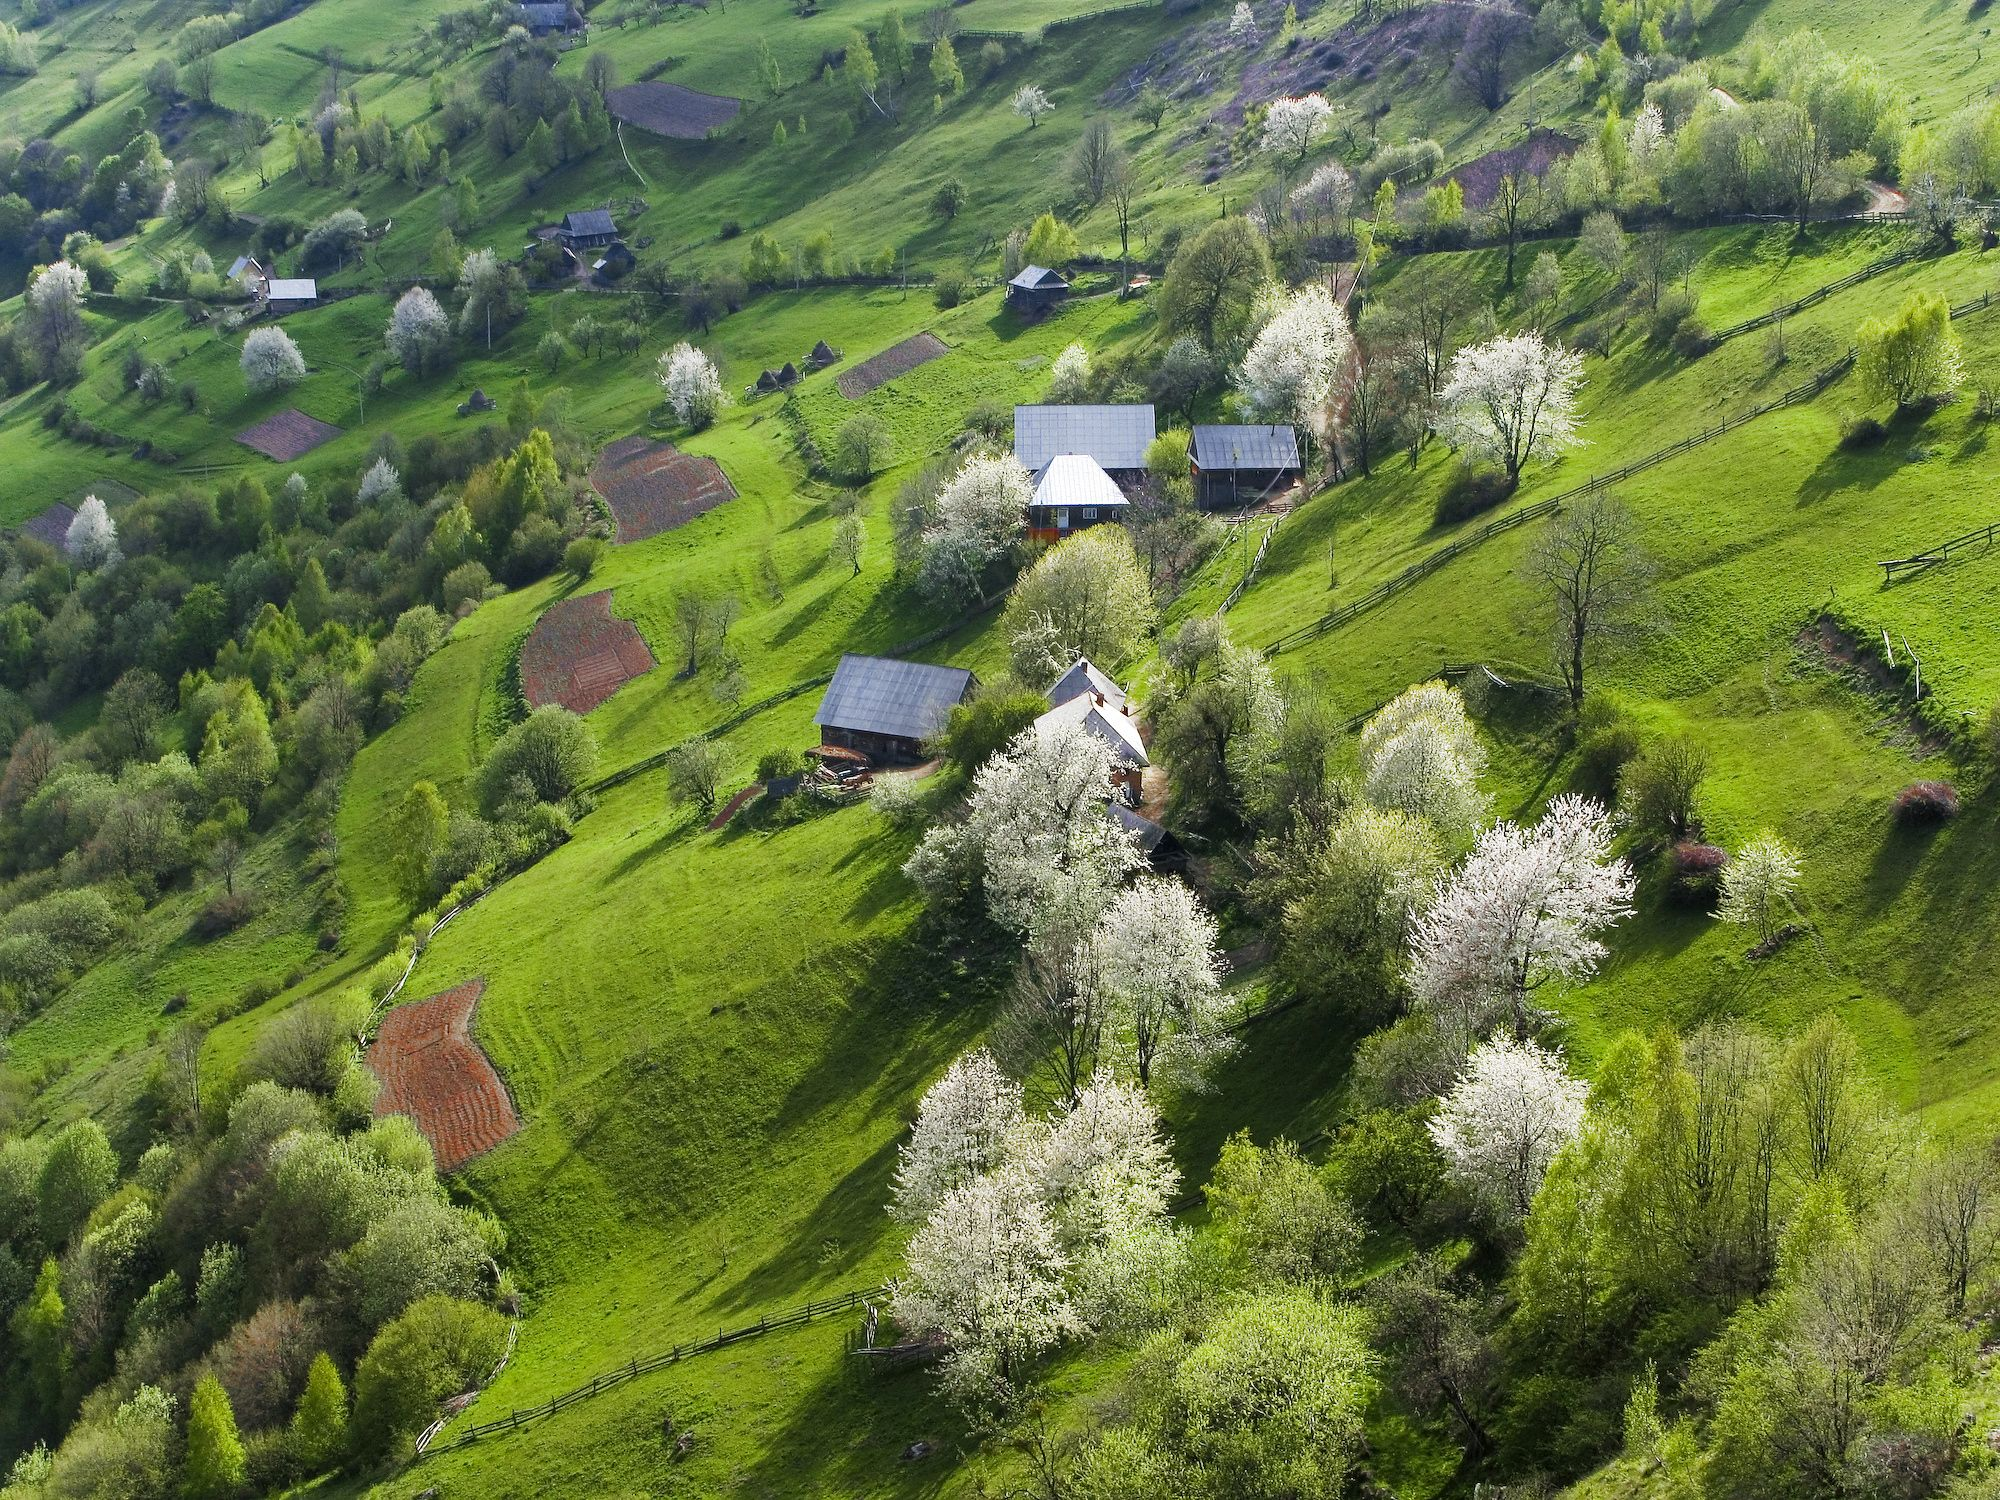 Transylvanian spring by munteanu adrian